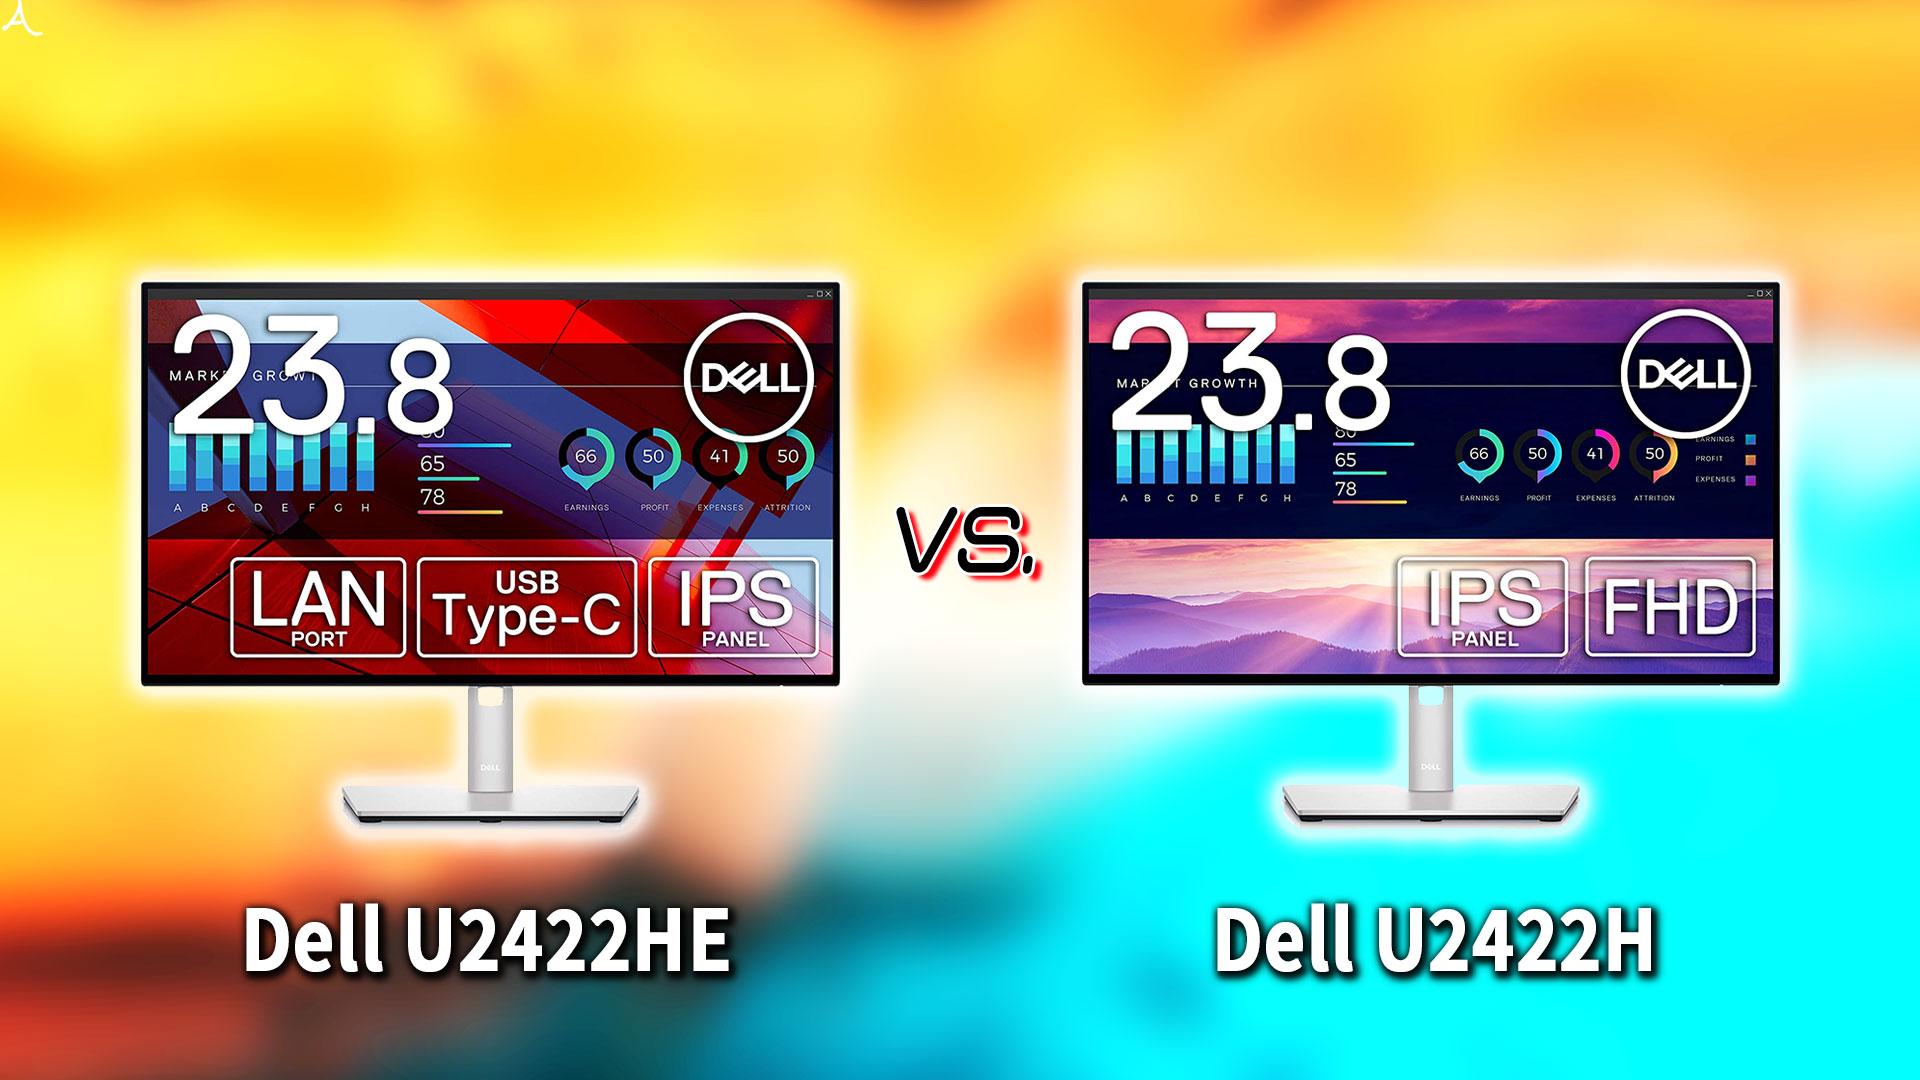 「Dell U2422HE」と「U2422H」の違いを比較:どっちを買う?